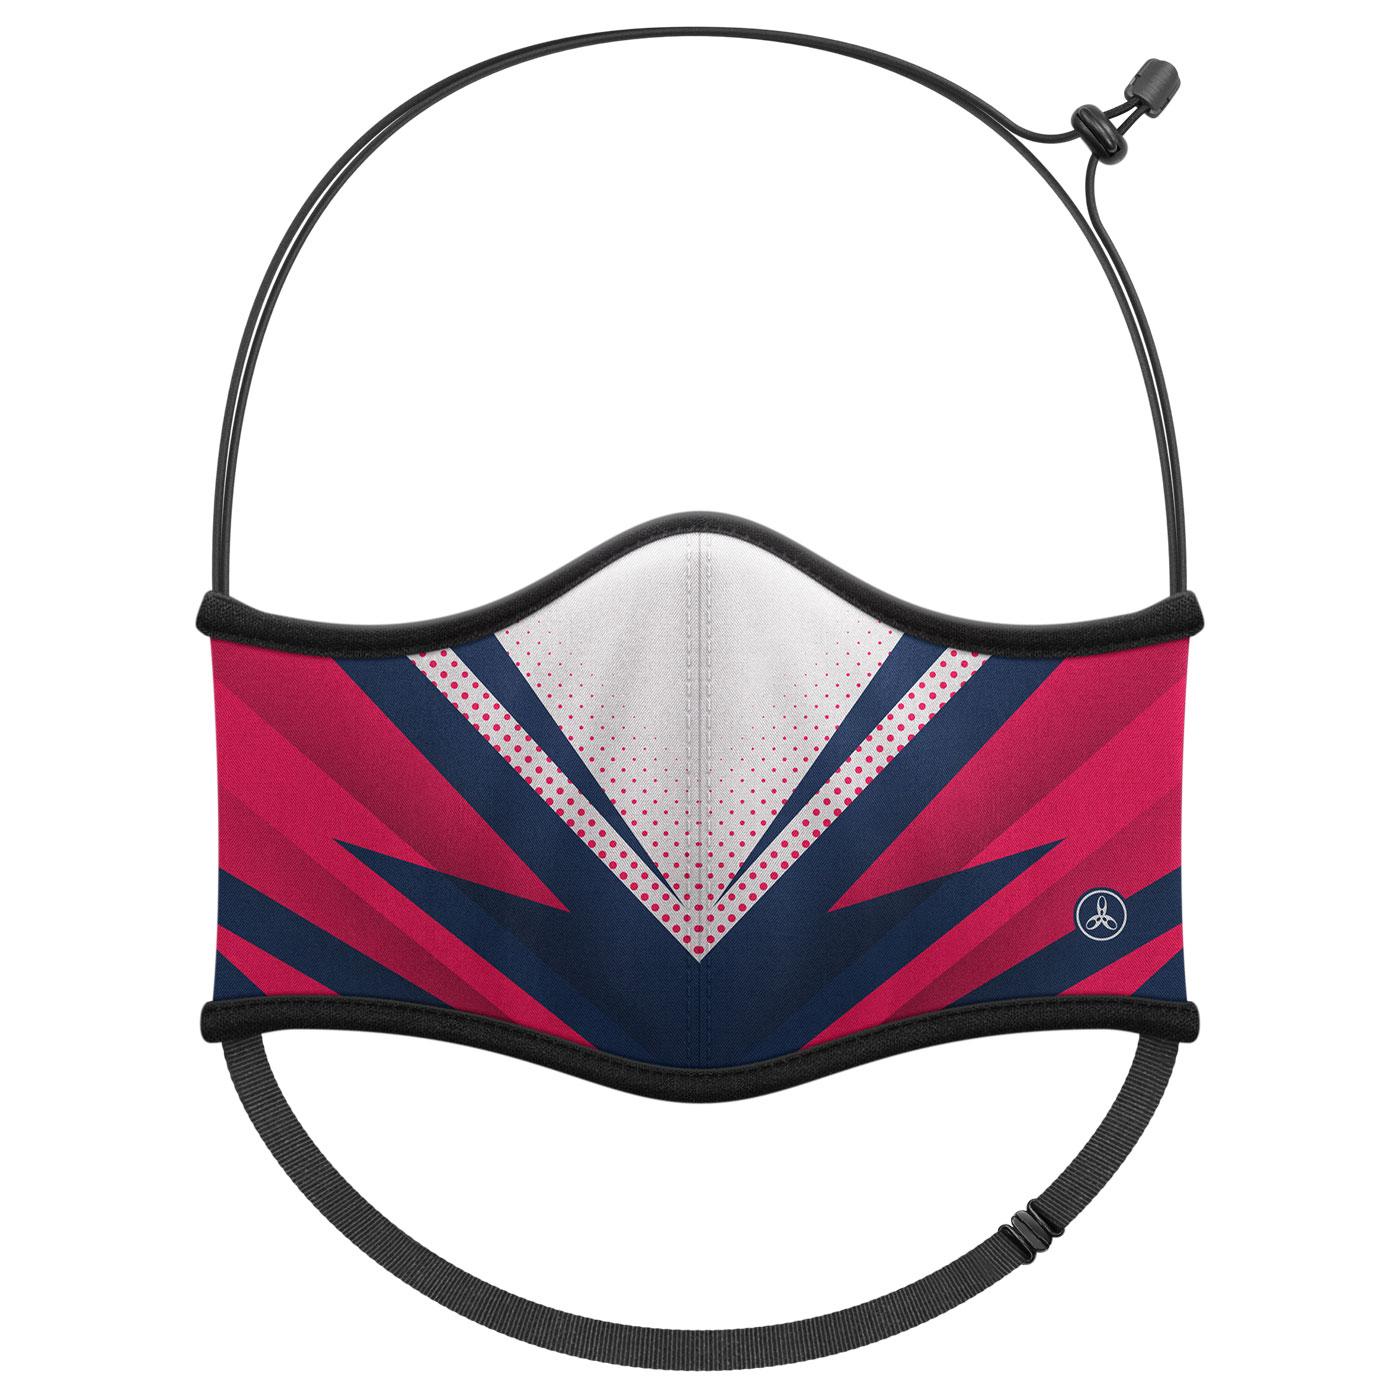 HODARLA 運動舒適口罩6032213 - 深藍紅白